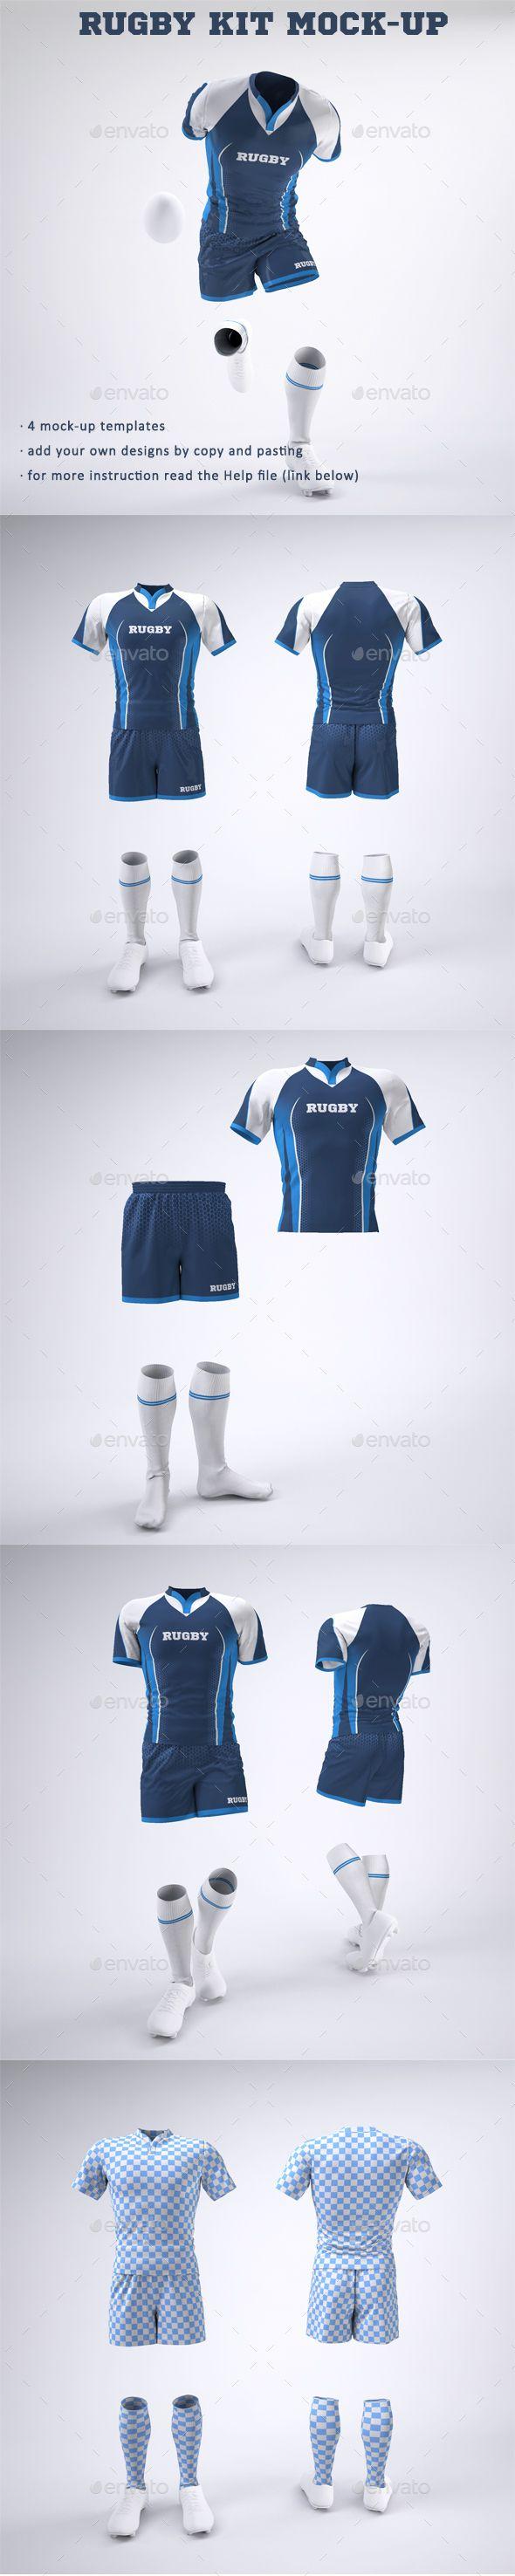 Download Rugby Team Uniform Mock Up Rugby Team Team Uniforms Clothing Mockup